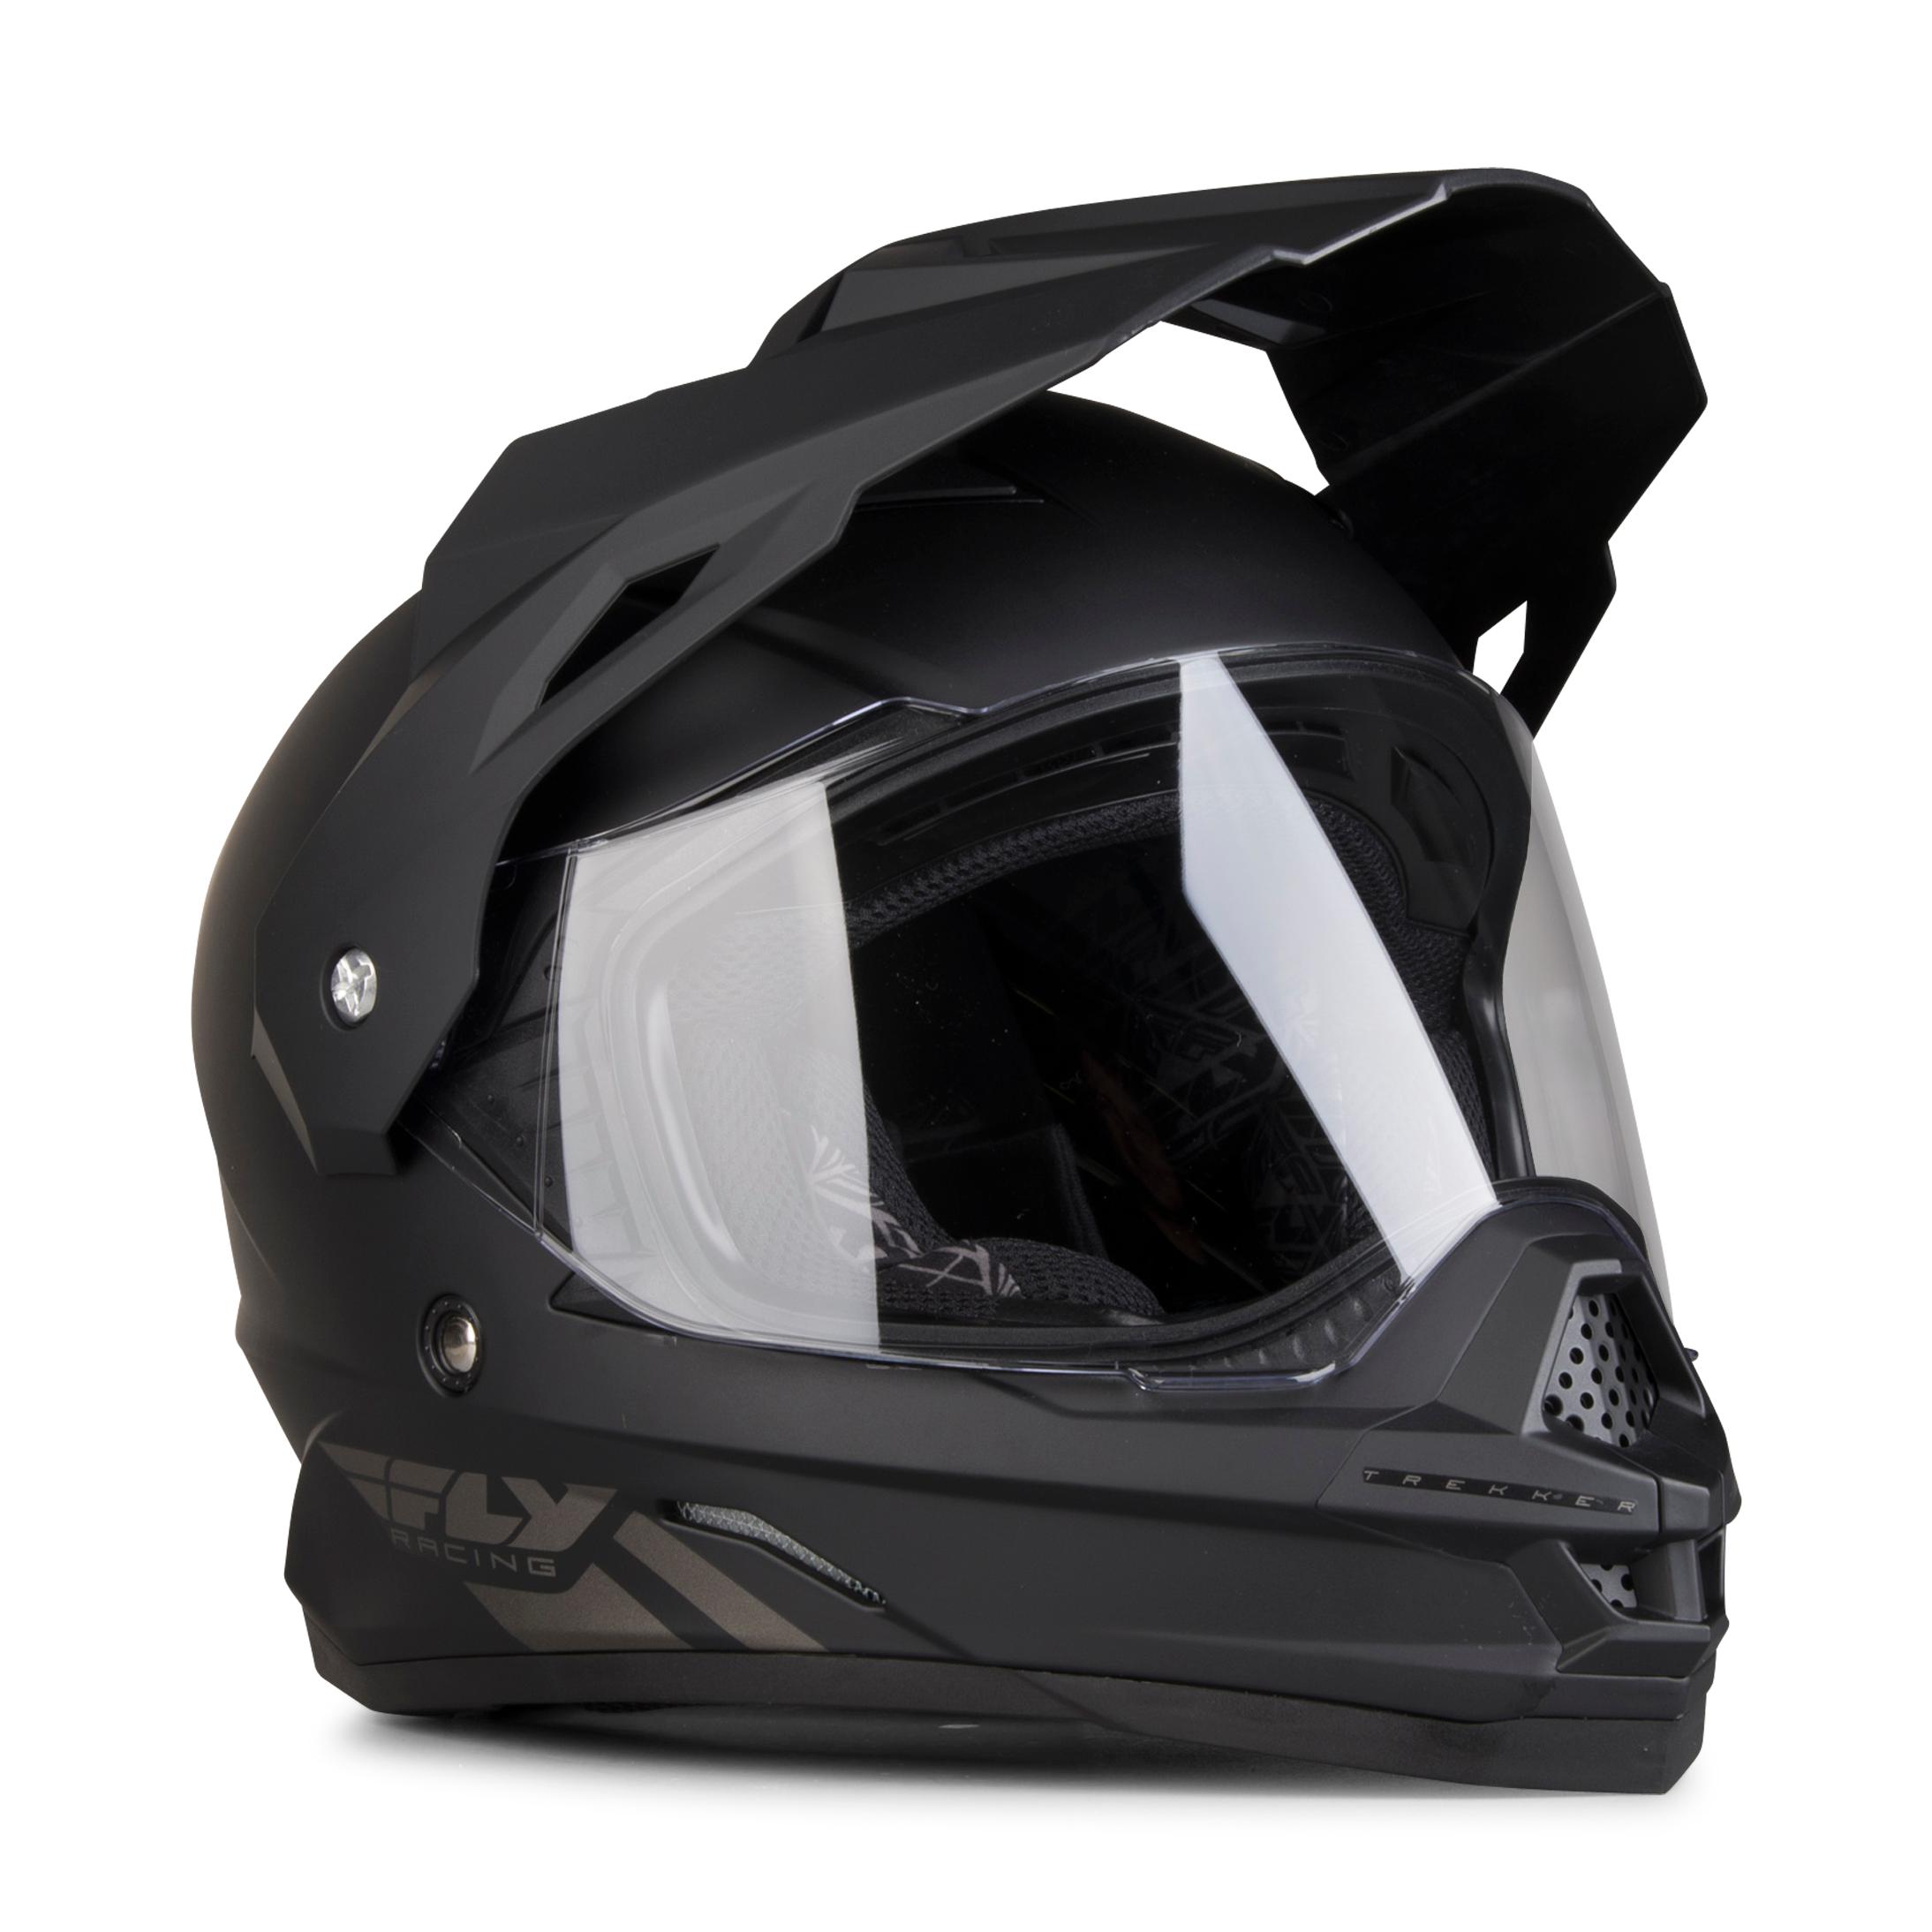 FLY Racing Casque Aventure FLY Trekker - Noir mat S 55-56cm